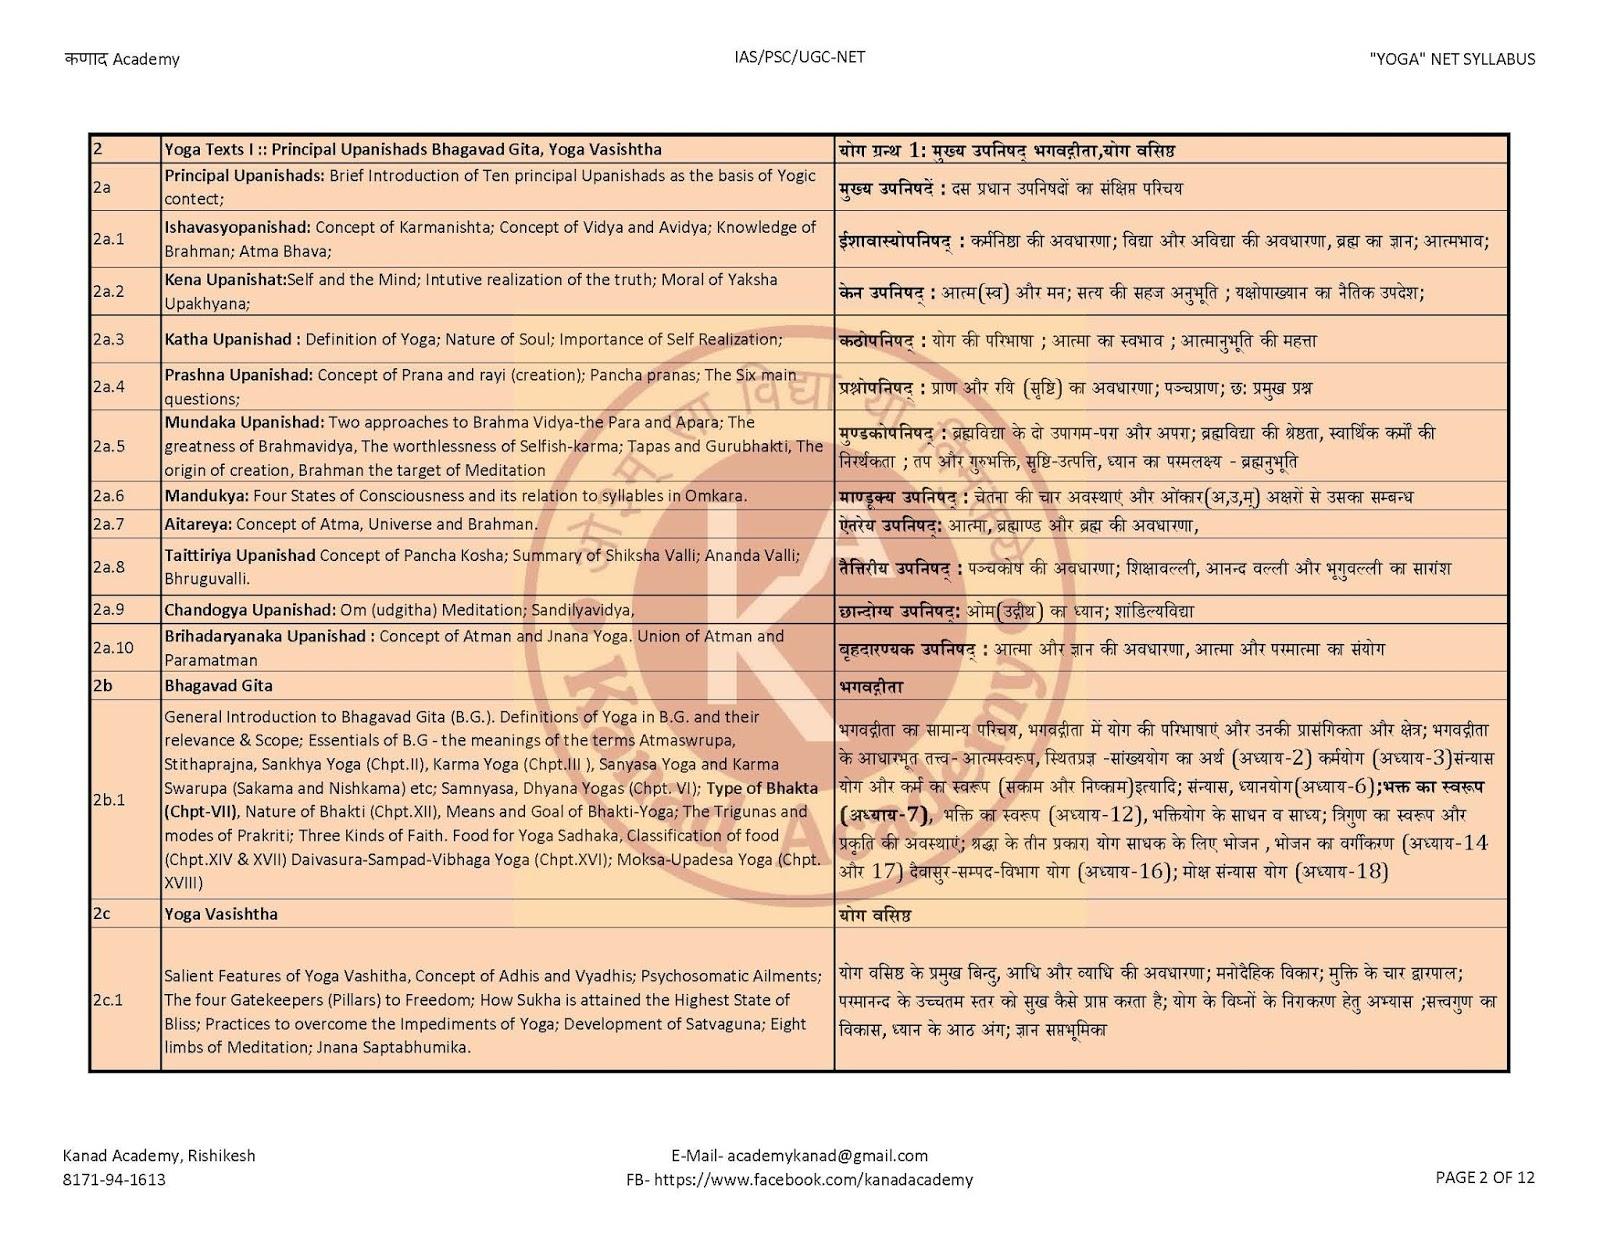 New UGC NET YOGA SYLLABUS (From 2019) IN HINDI/ English